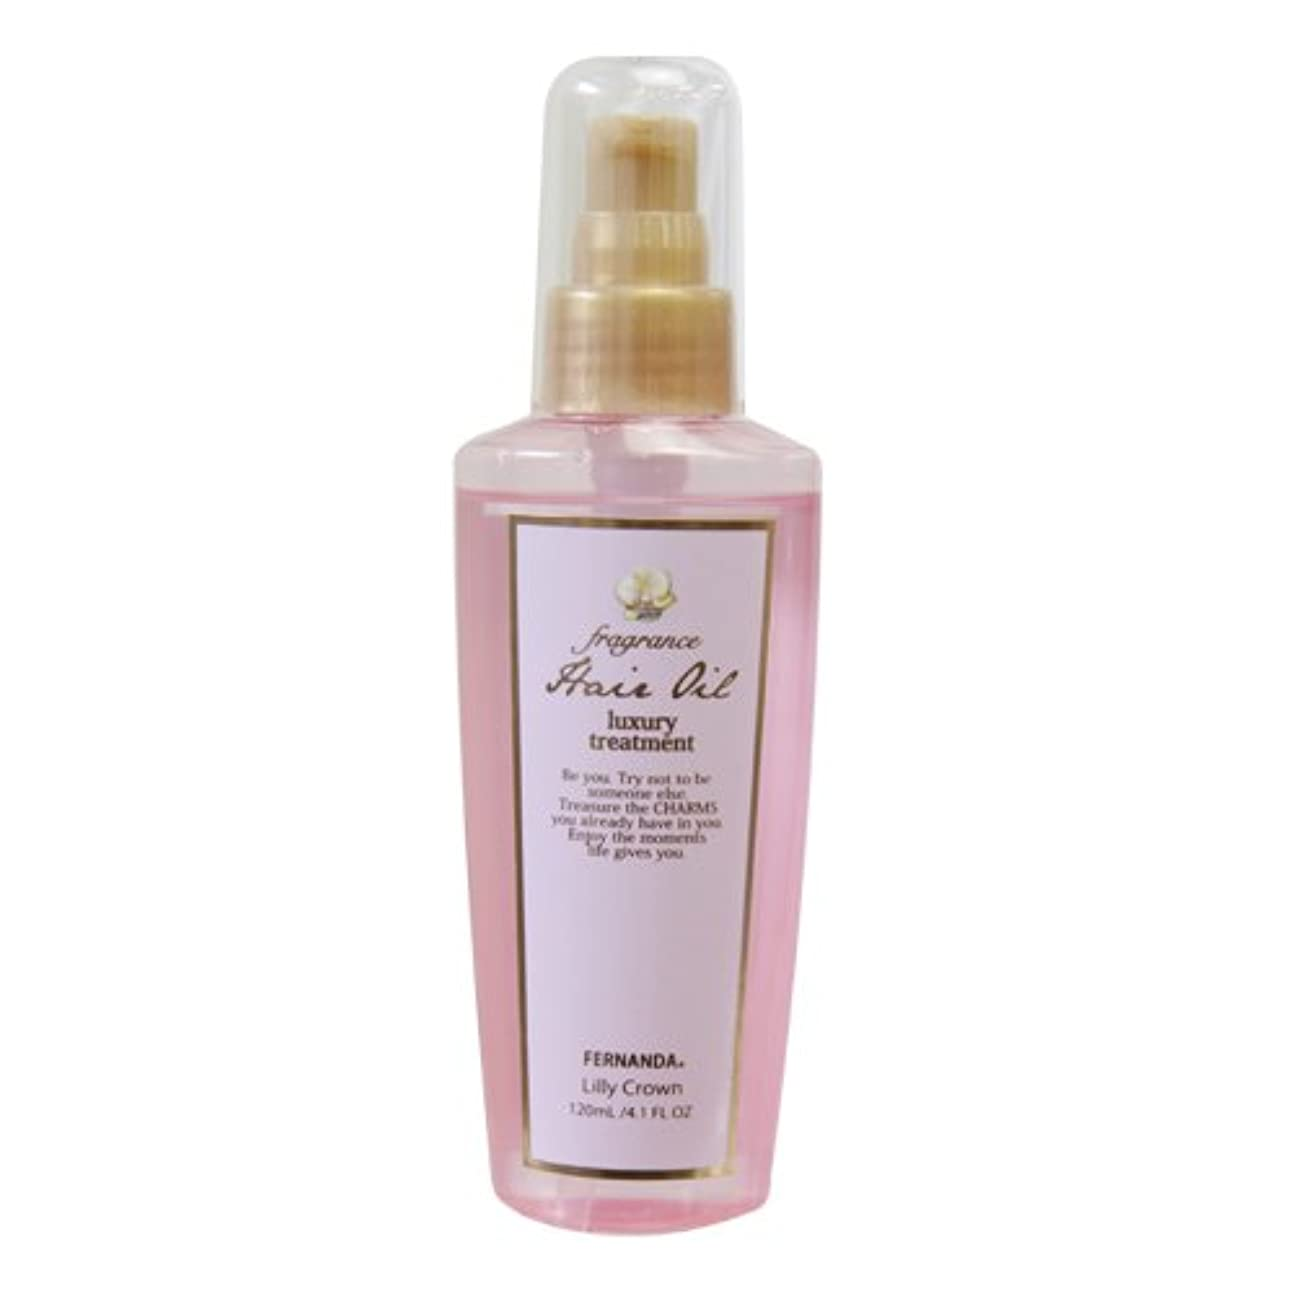 FERNANDA(フェルナンダ) Hair Oil Lilly Crown (ヘアーオイル リリークラウン)